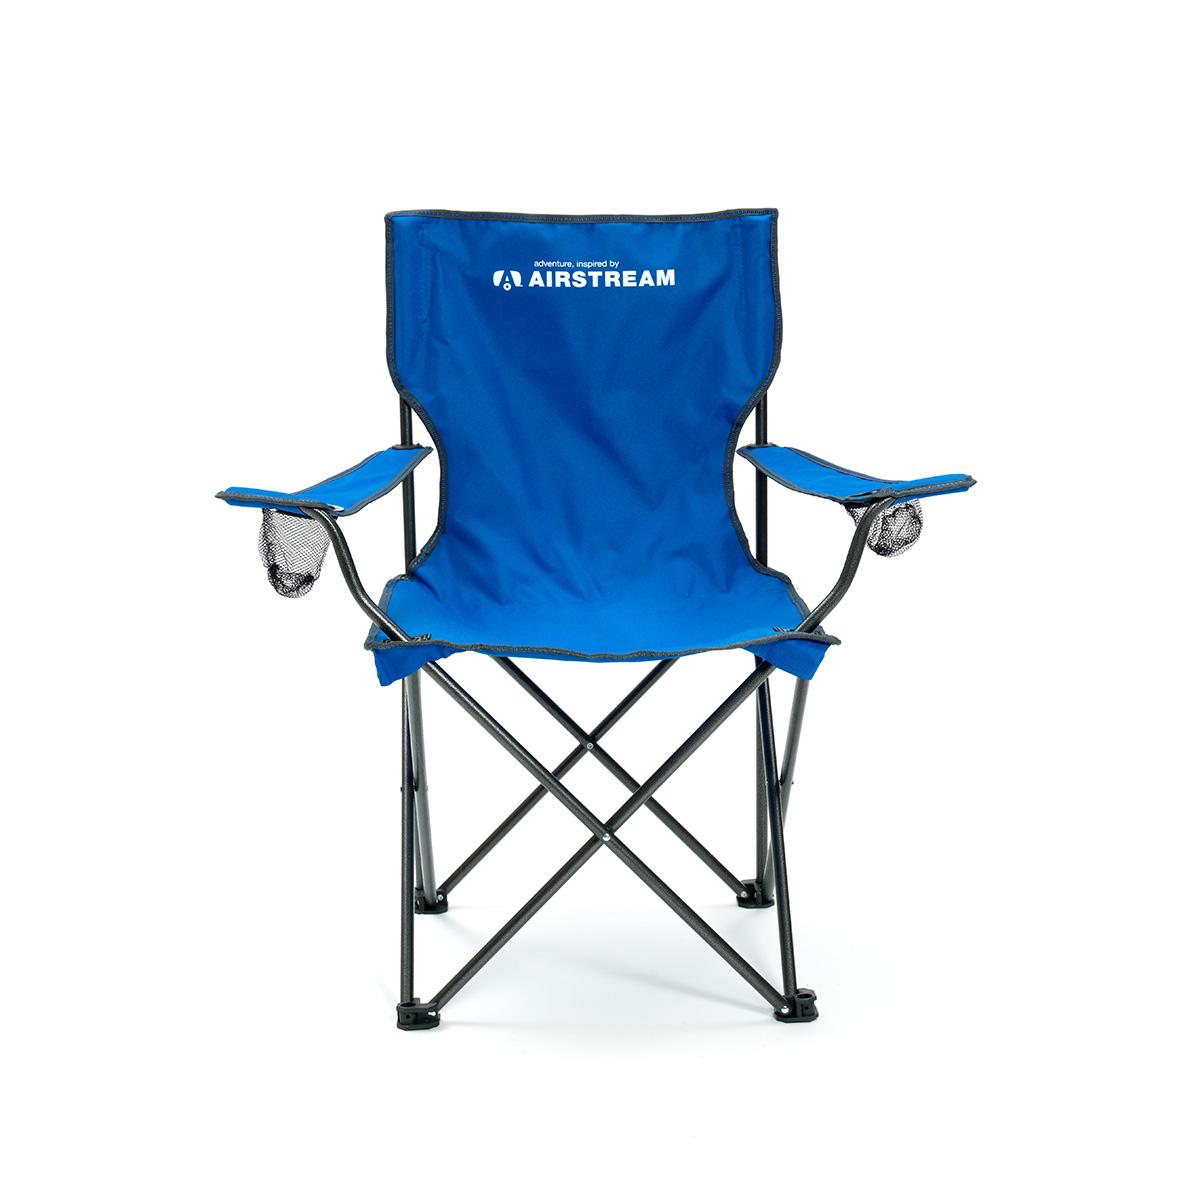 AIRMKT eCom PN 41169W-01 Airstream Fold Up Chair Straight 41730 WEB